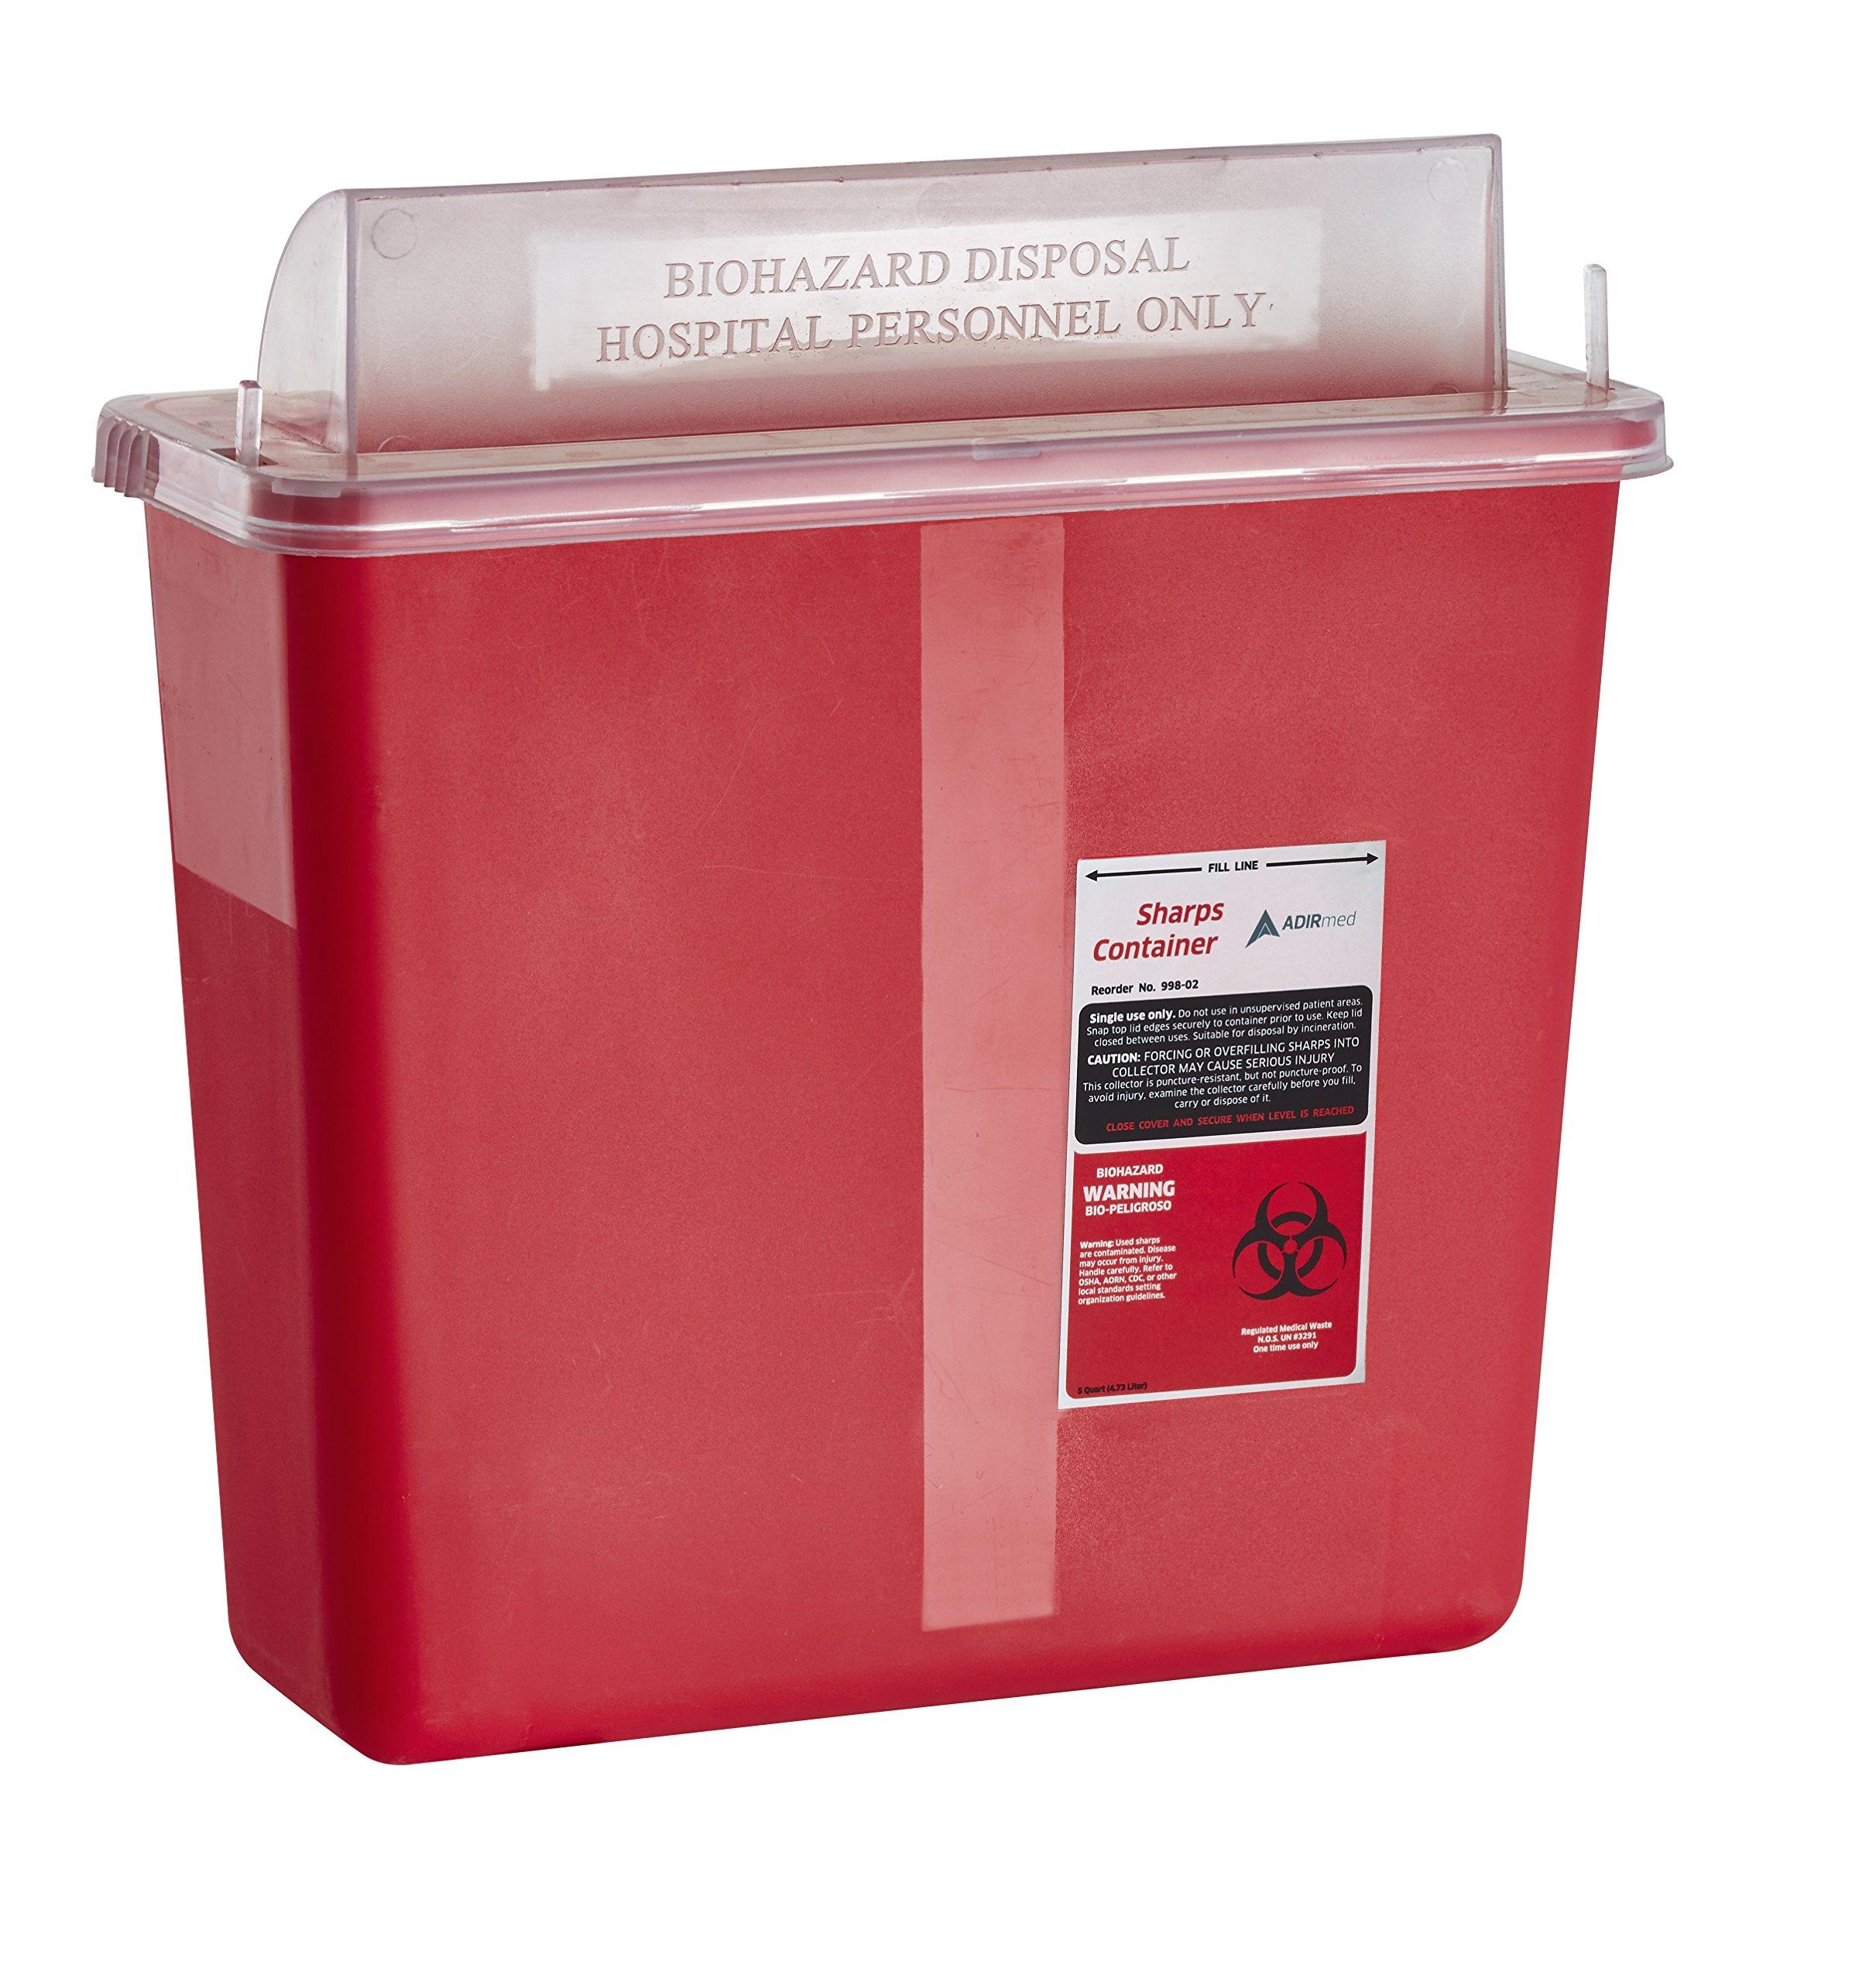 AdirMed Sharps & Needle Biohazard Disposal Container - 5 Quart - Mailbox Style Horizontal Lid - 1 Pack